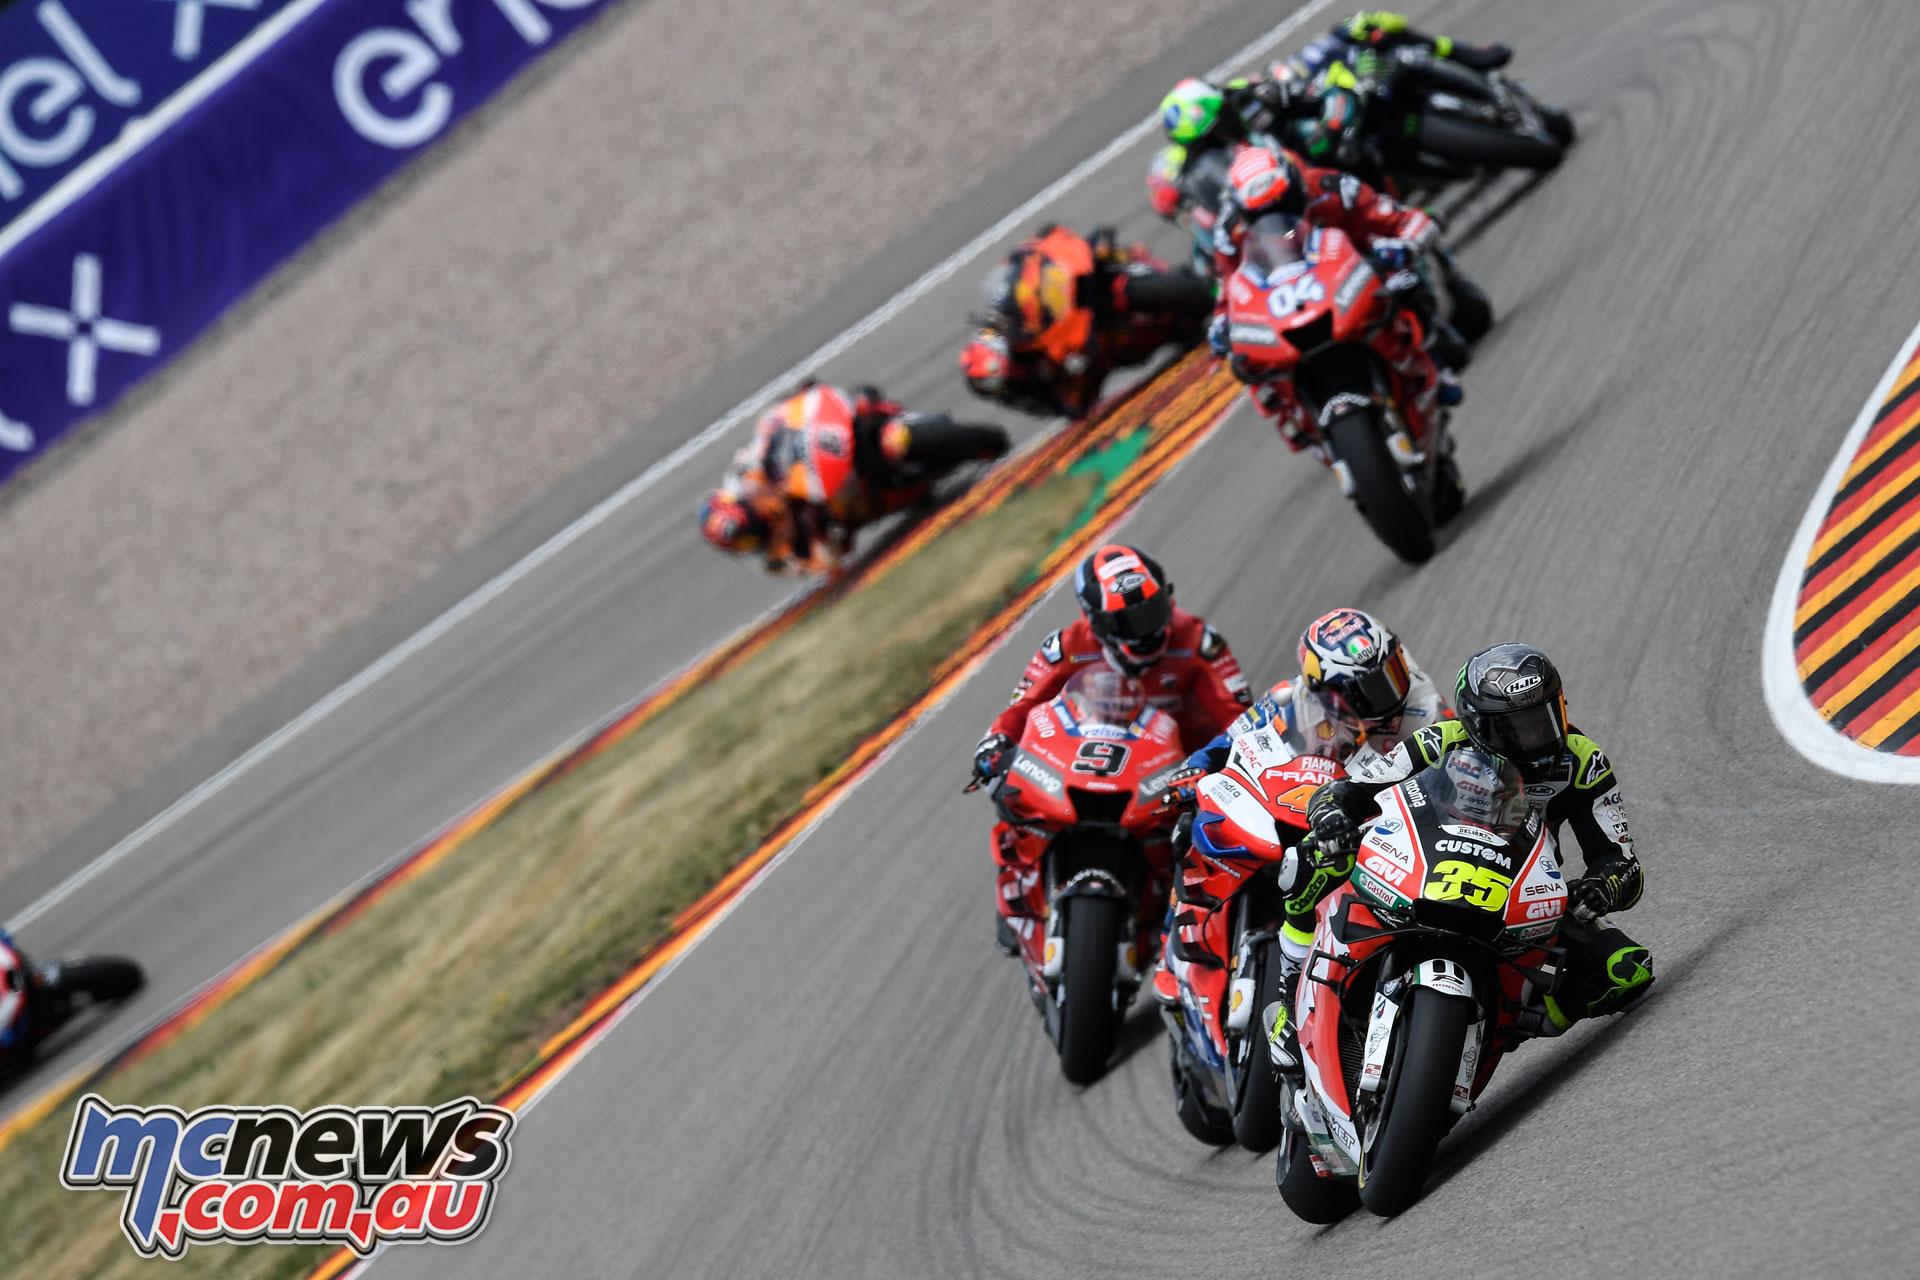 MotoGP Rnd Sachsenring Germany Cal Crutchlow G